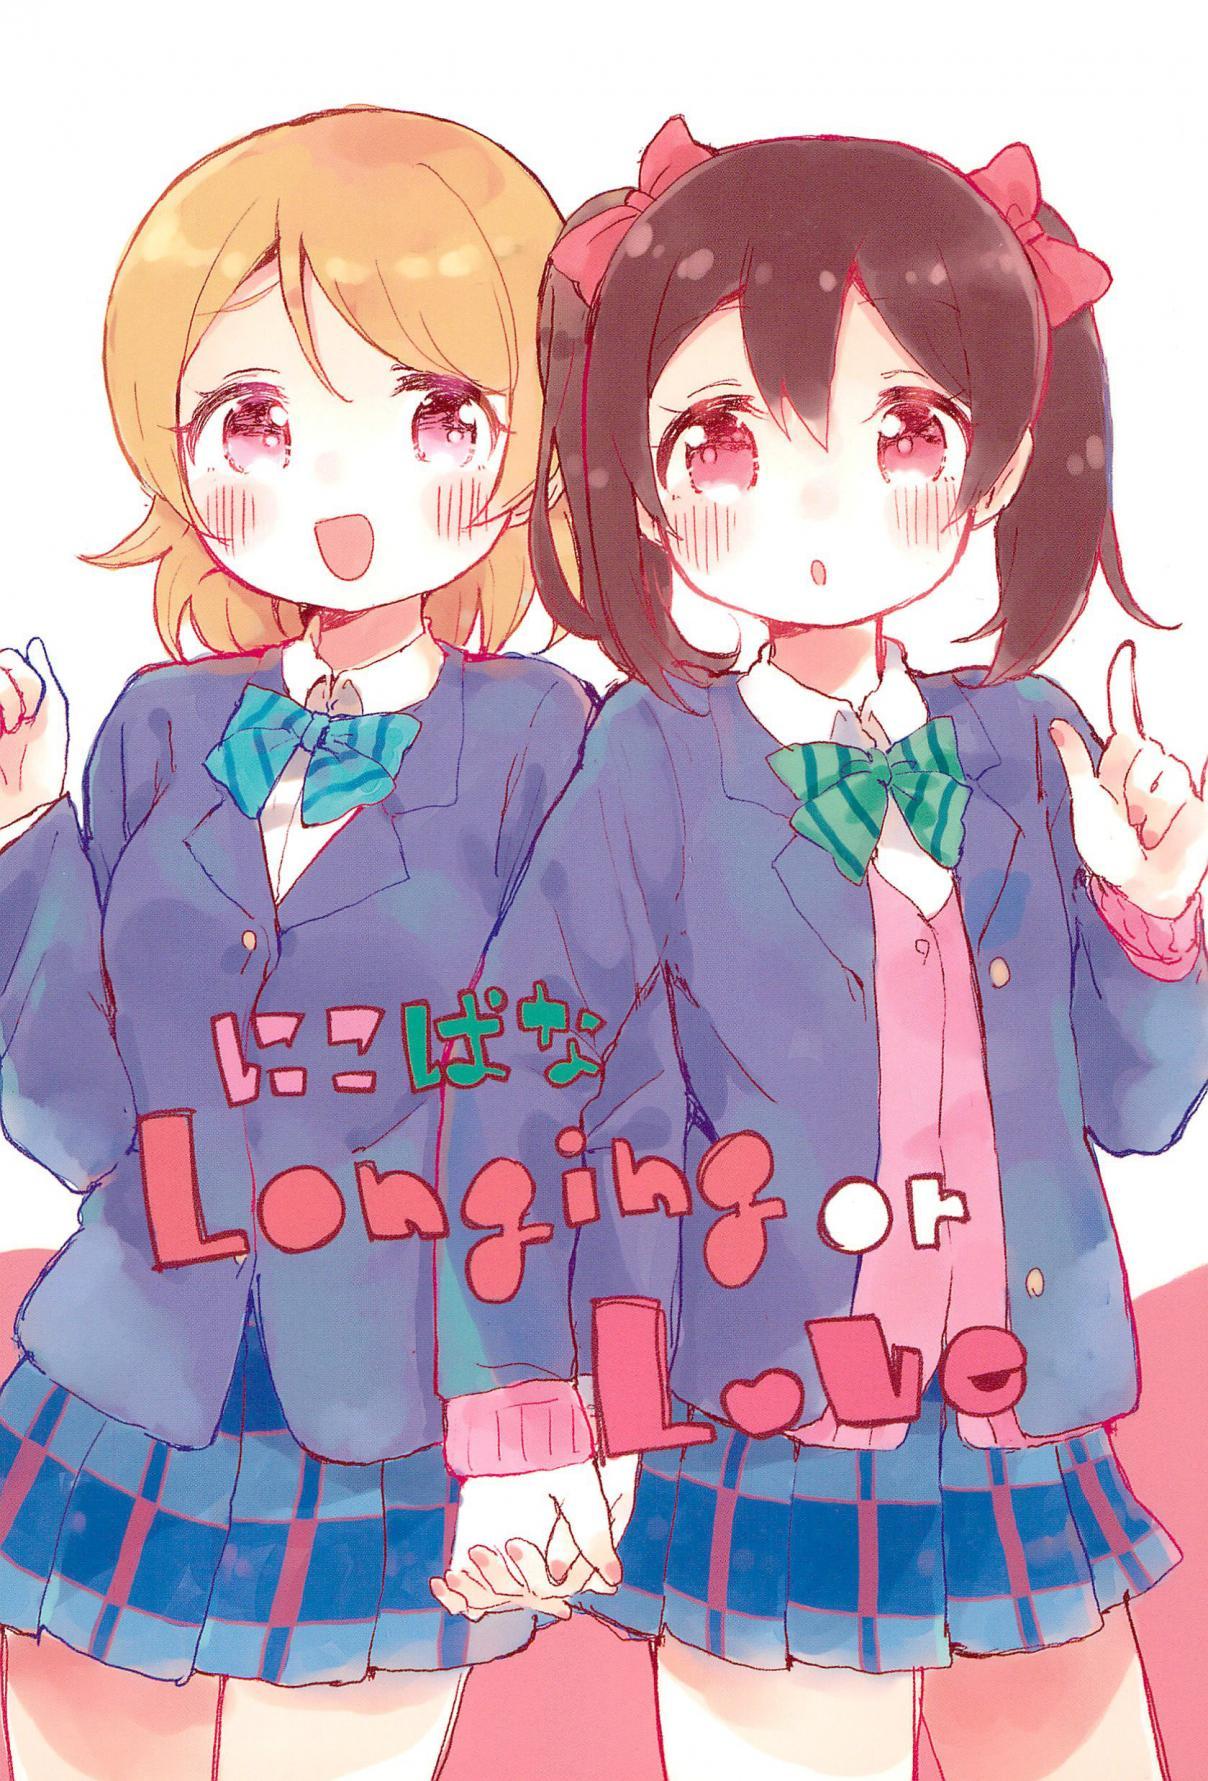 https://manga.mangadogs.com/comics/pic2/15/33231/971323/b7e06877d36a4adf8619d79a01233983.jpg Page 1